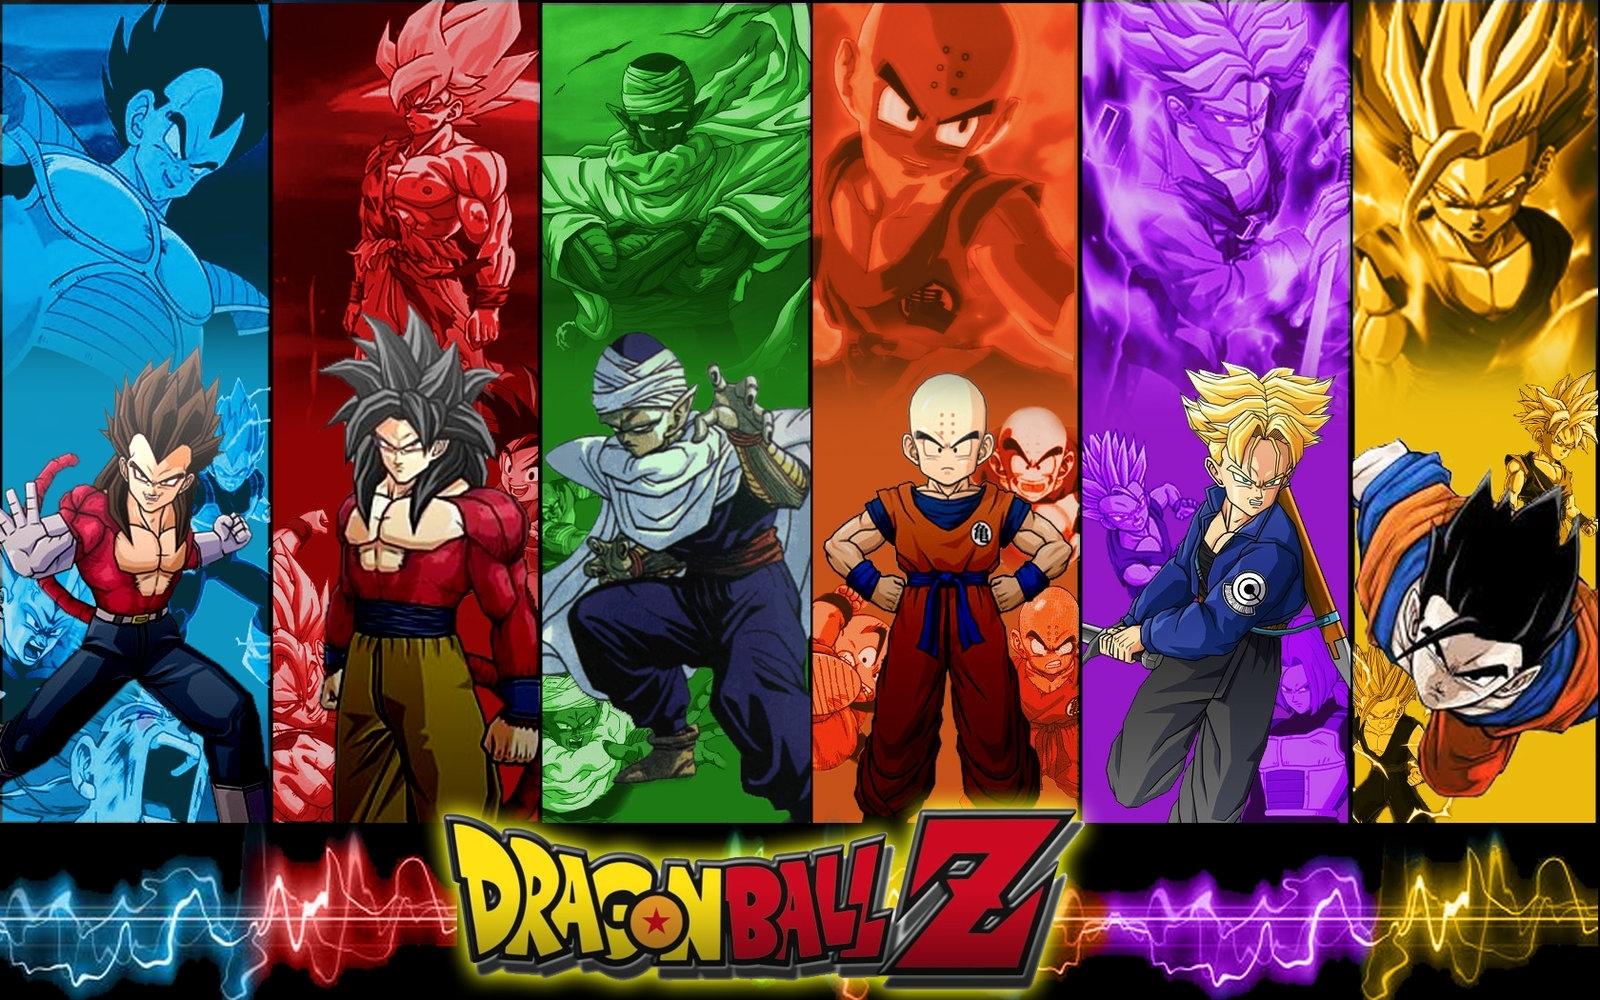 dragon ball z wallpapers hd goku free download | pixelstalk